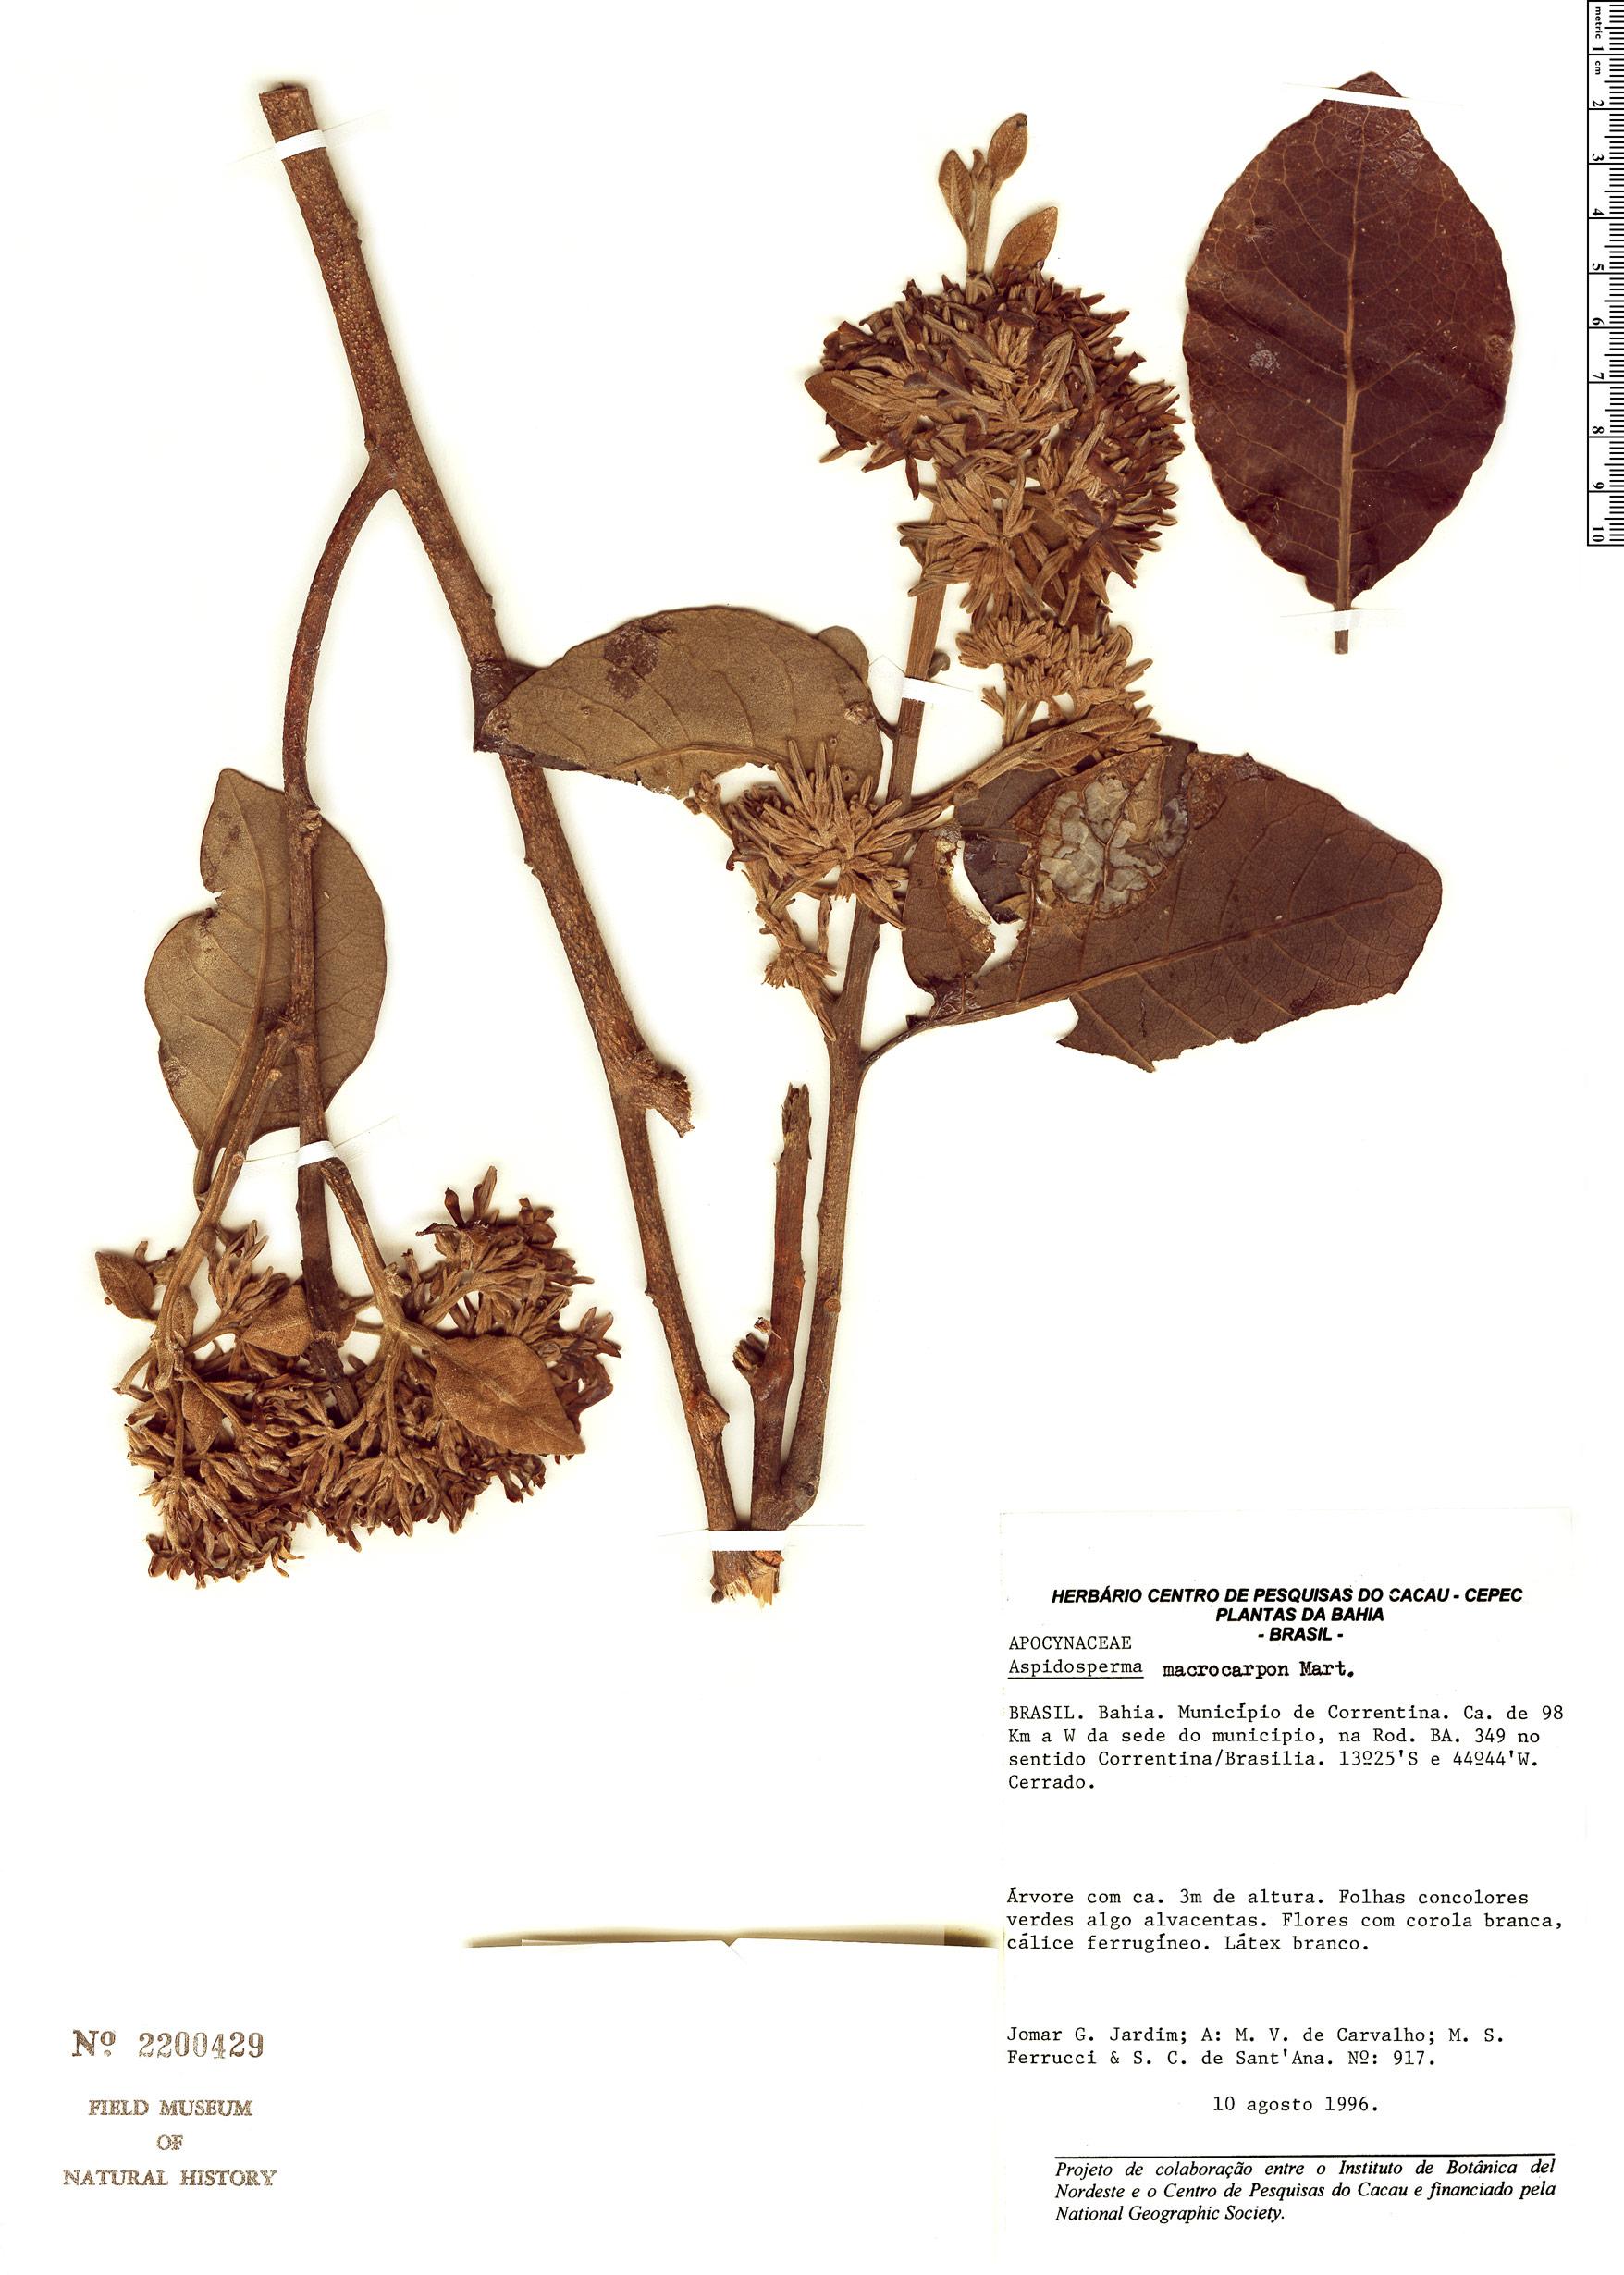 Specimen: Aspidosperma macrocarpon